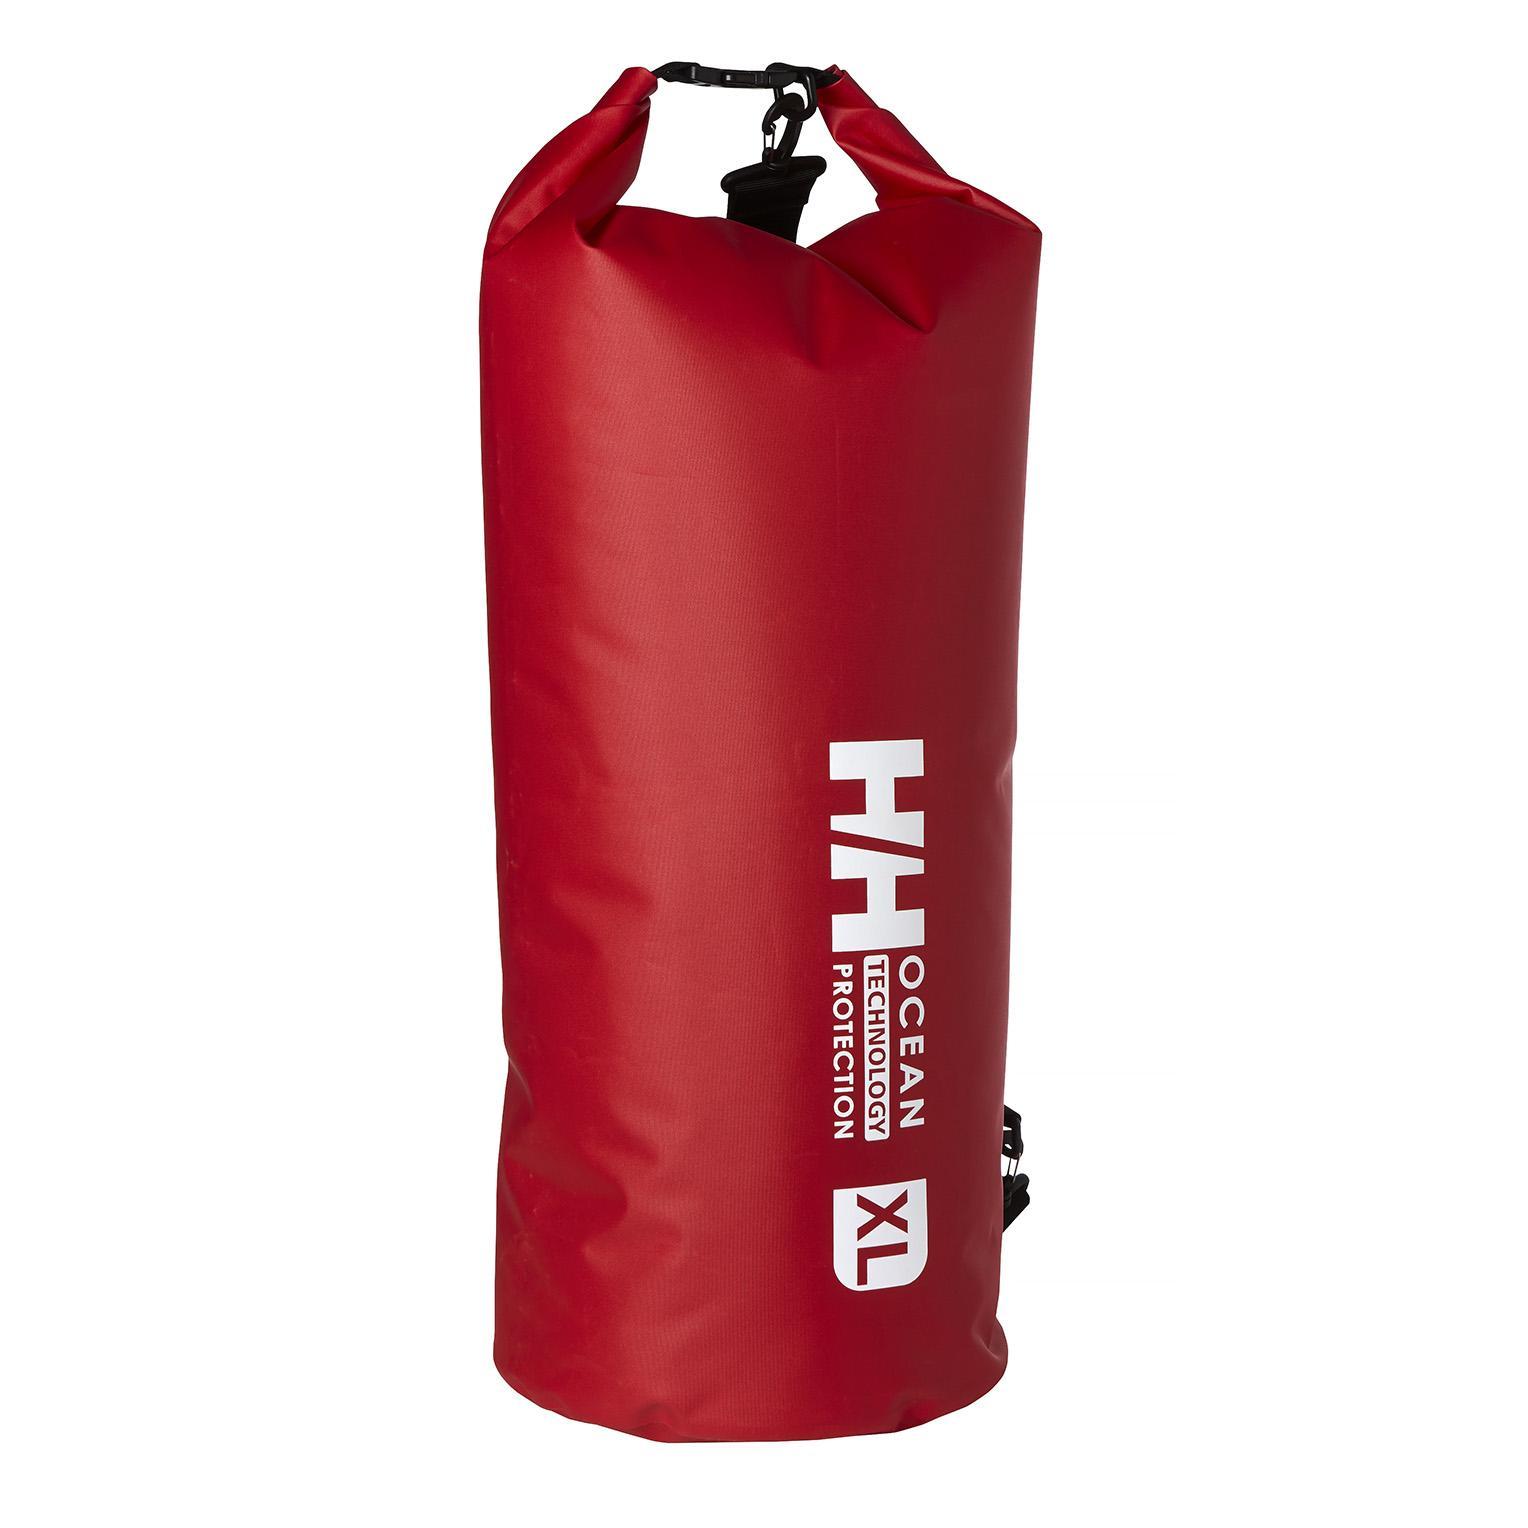 614f3403a8 Lyst - Helly Hansen Hh Ocean Dry Bag Xl in Red